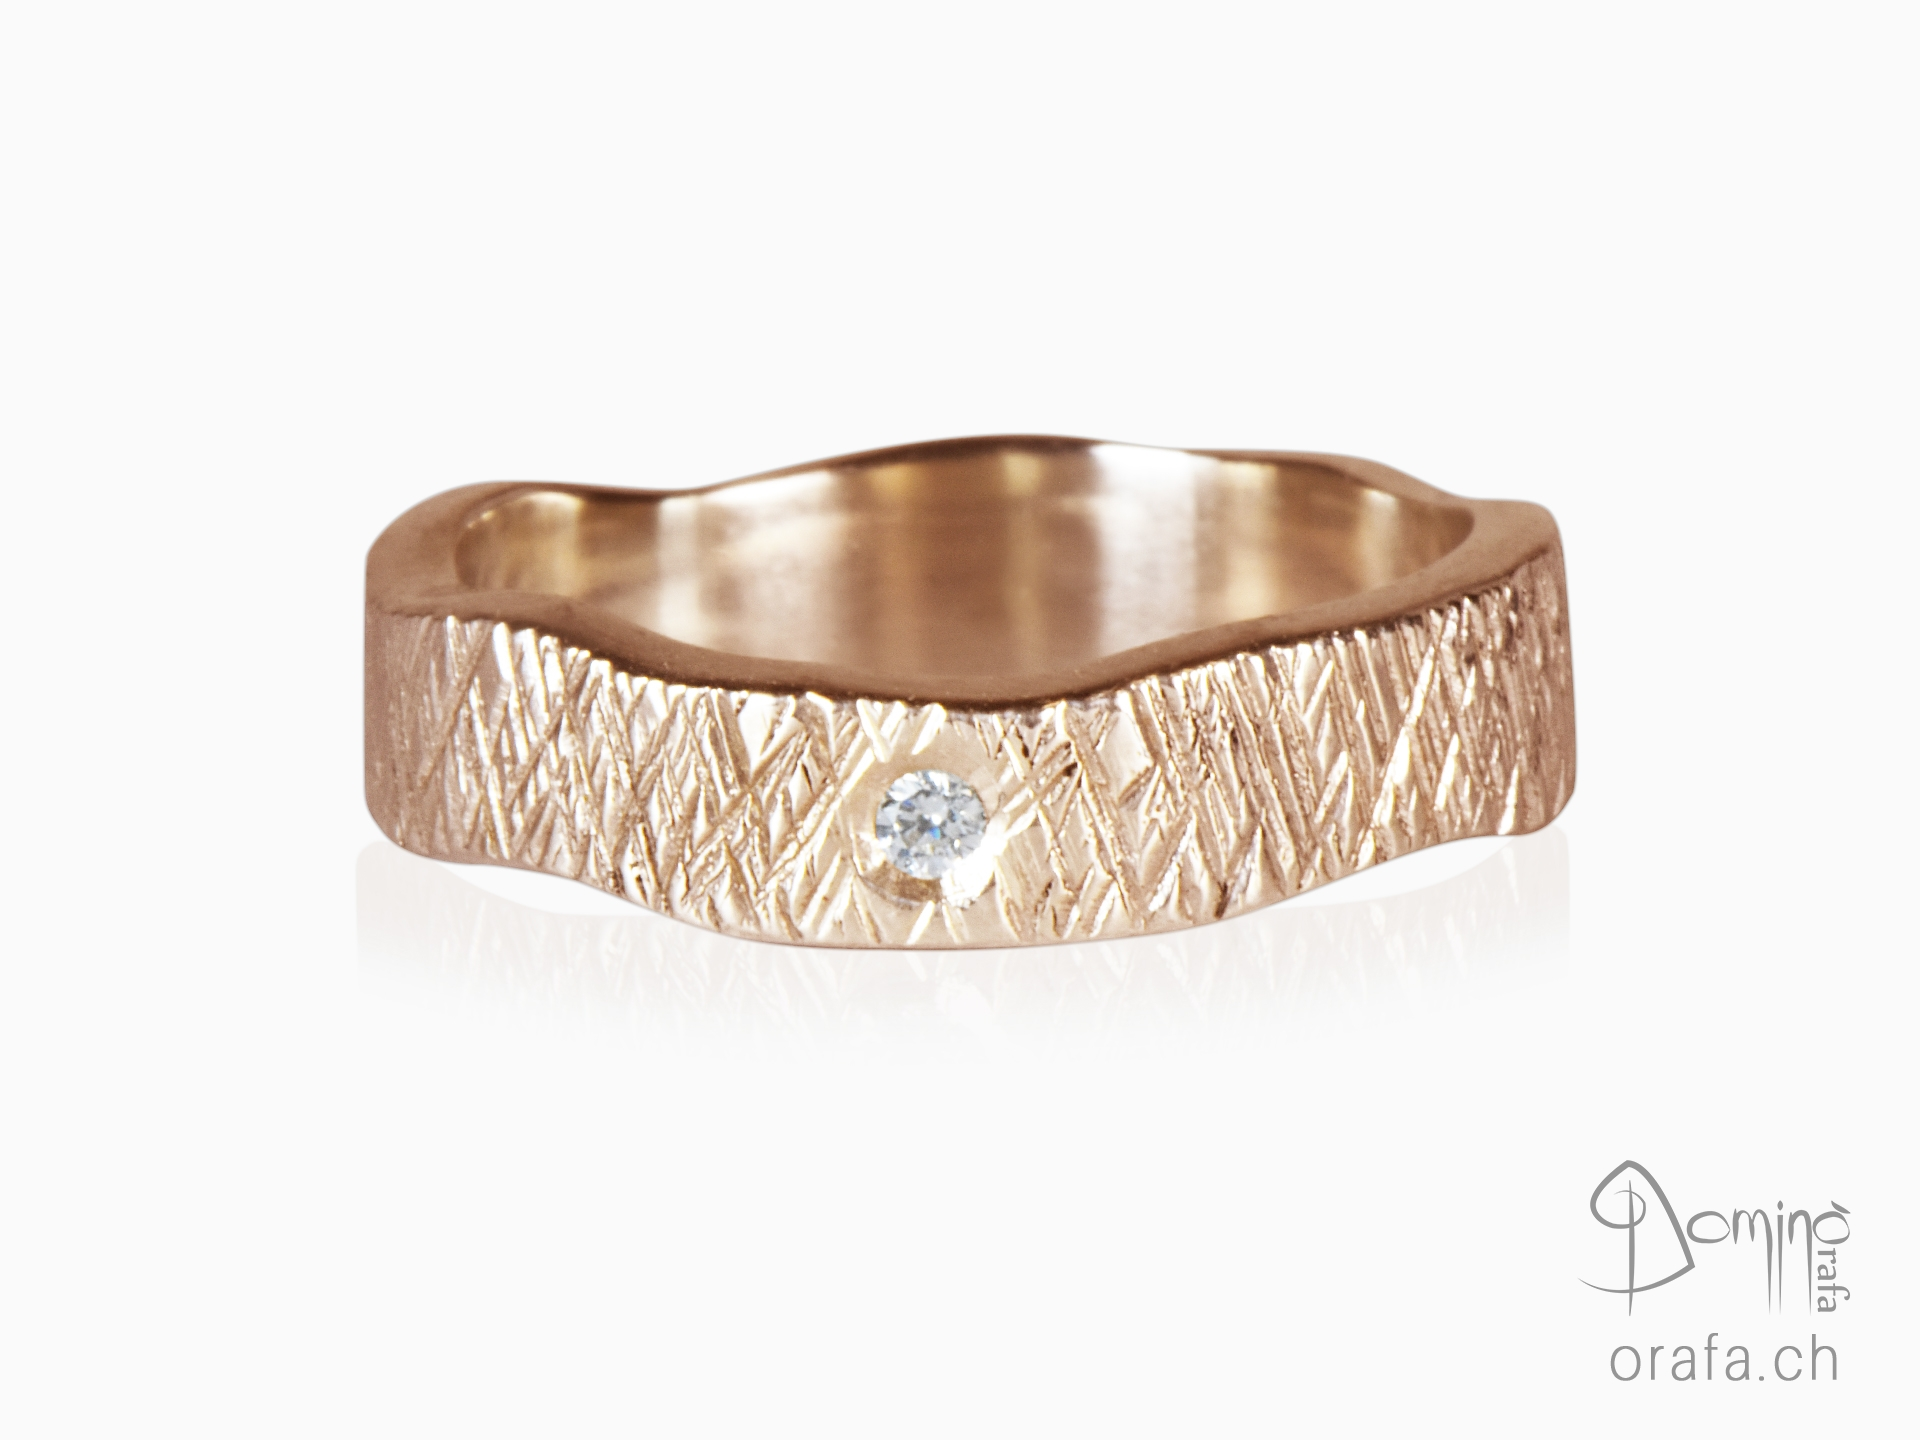 Crossed Linee ring with diamond